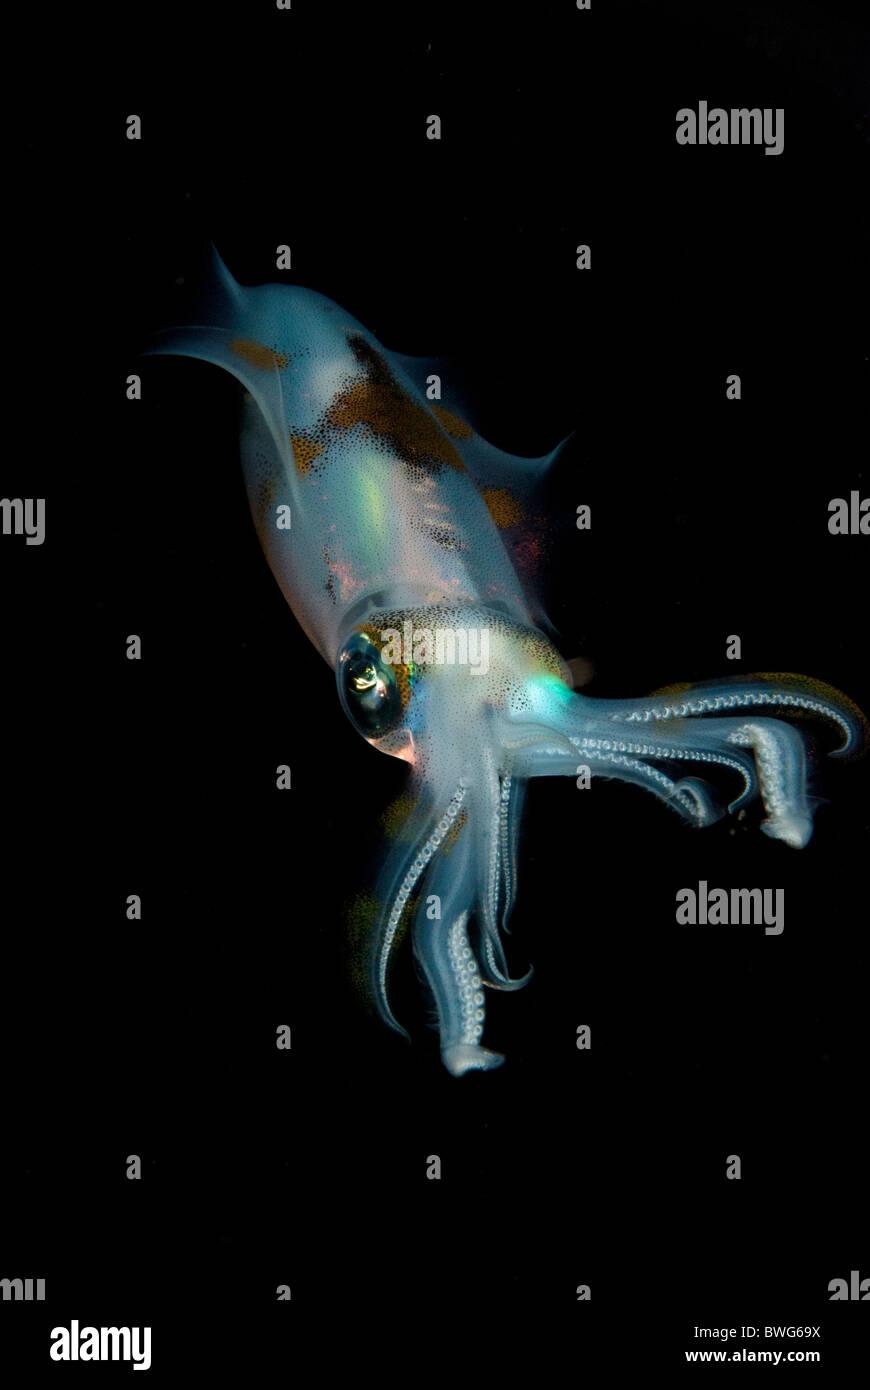 Squid at Night - Stock Image